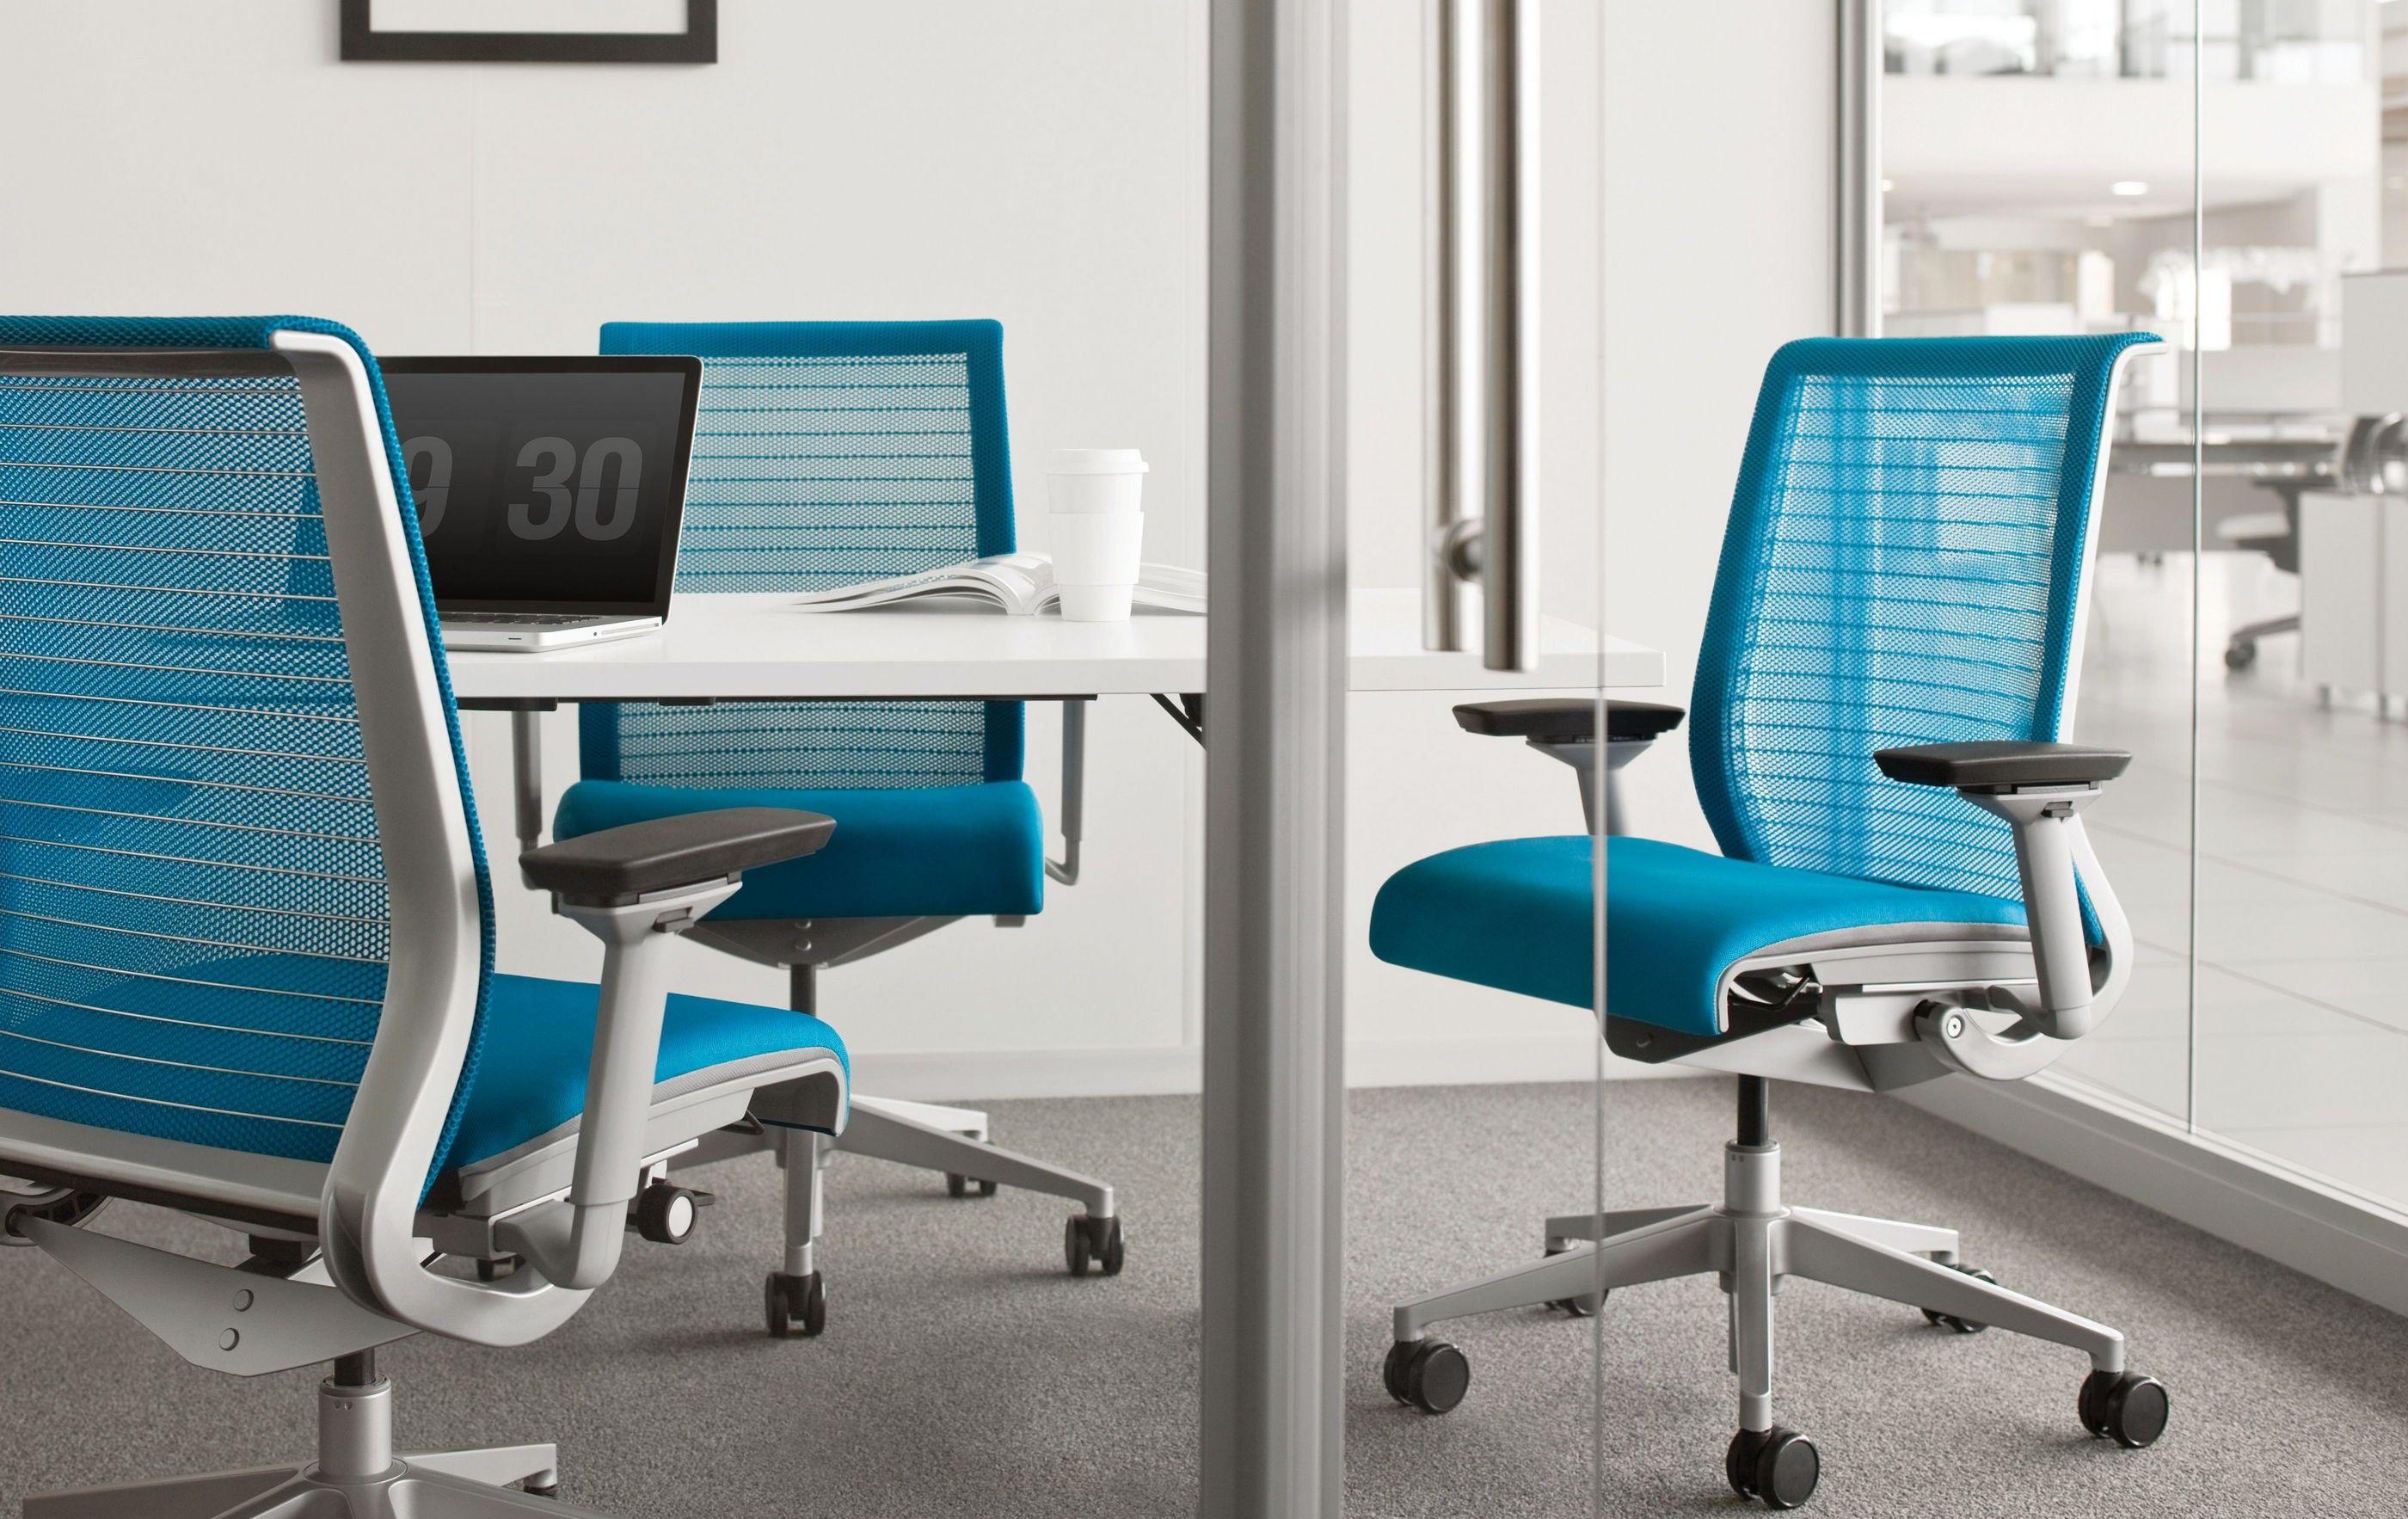 Stahl denke Bürostuhl | BüroMöbel | Pinterest | Bürostühle, Stahl ...